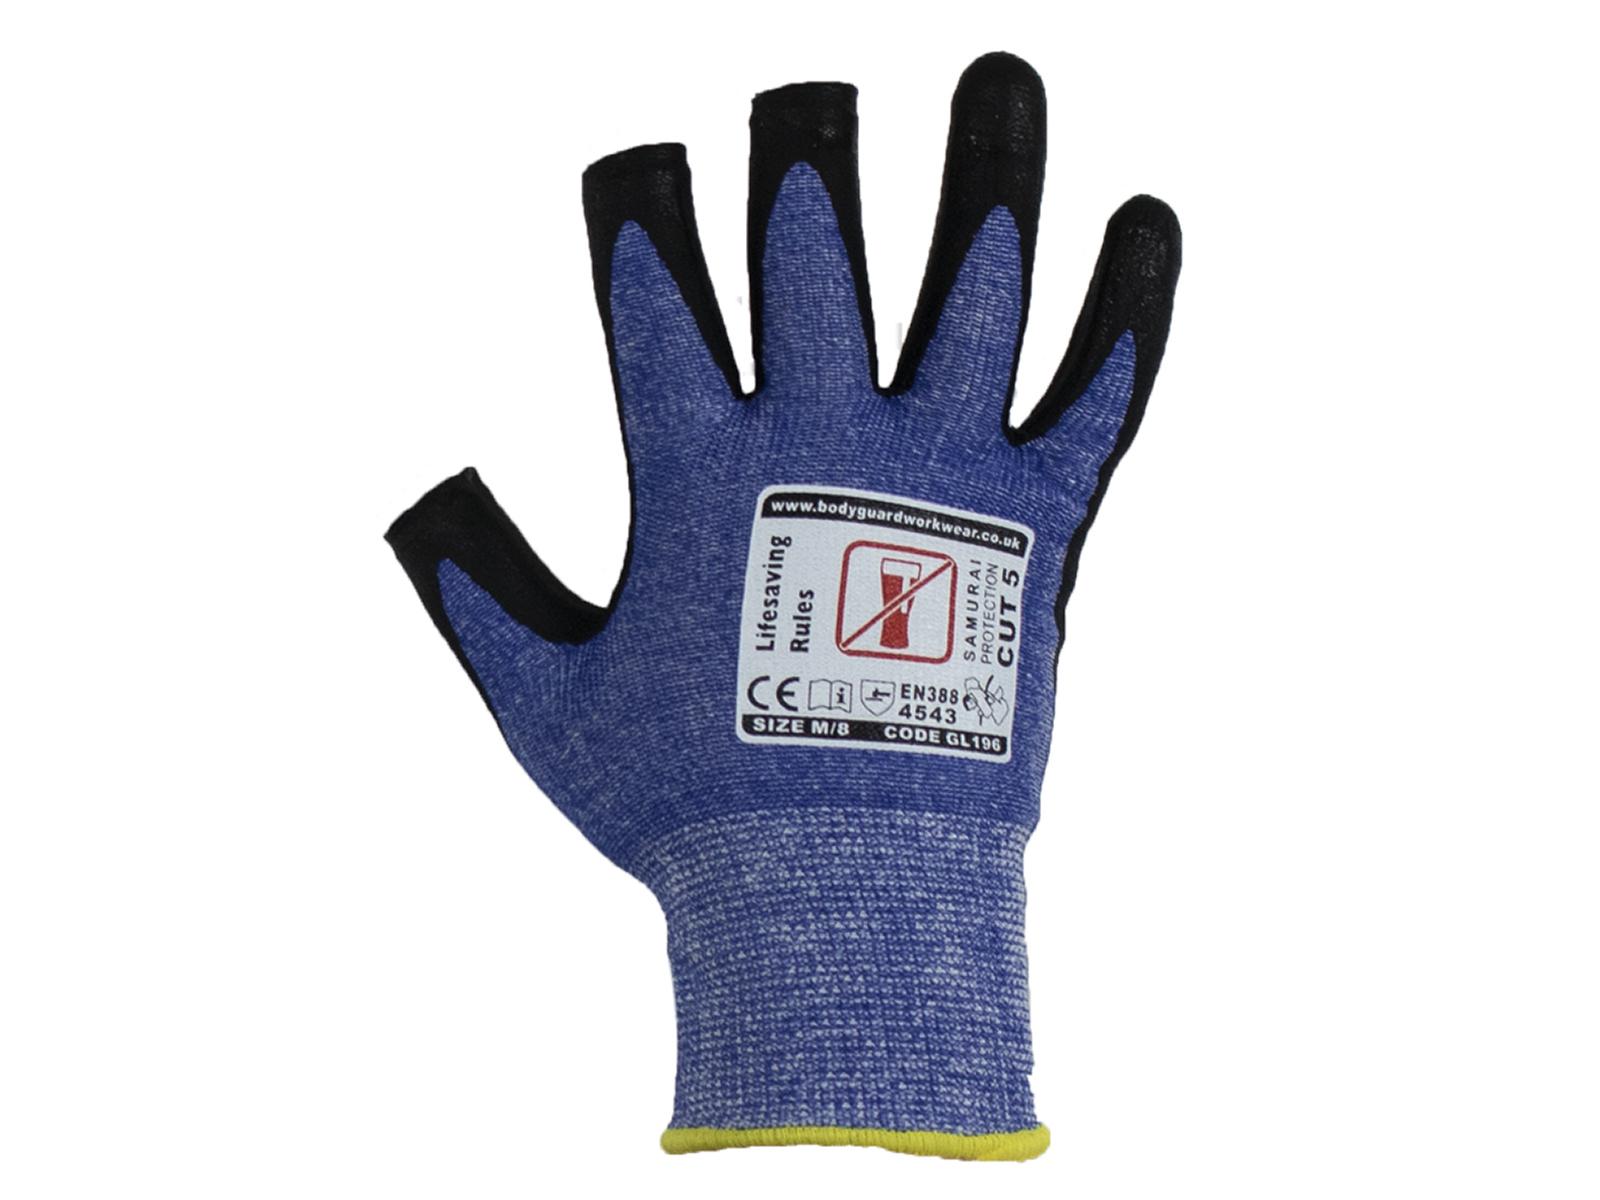 3 Digit Samurai Lite Cut 5 Safety Glove w/ fingertip contact